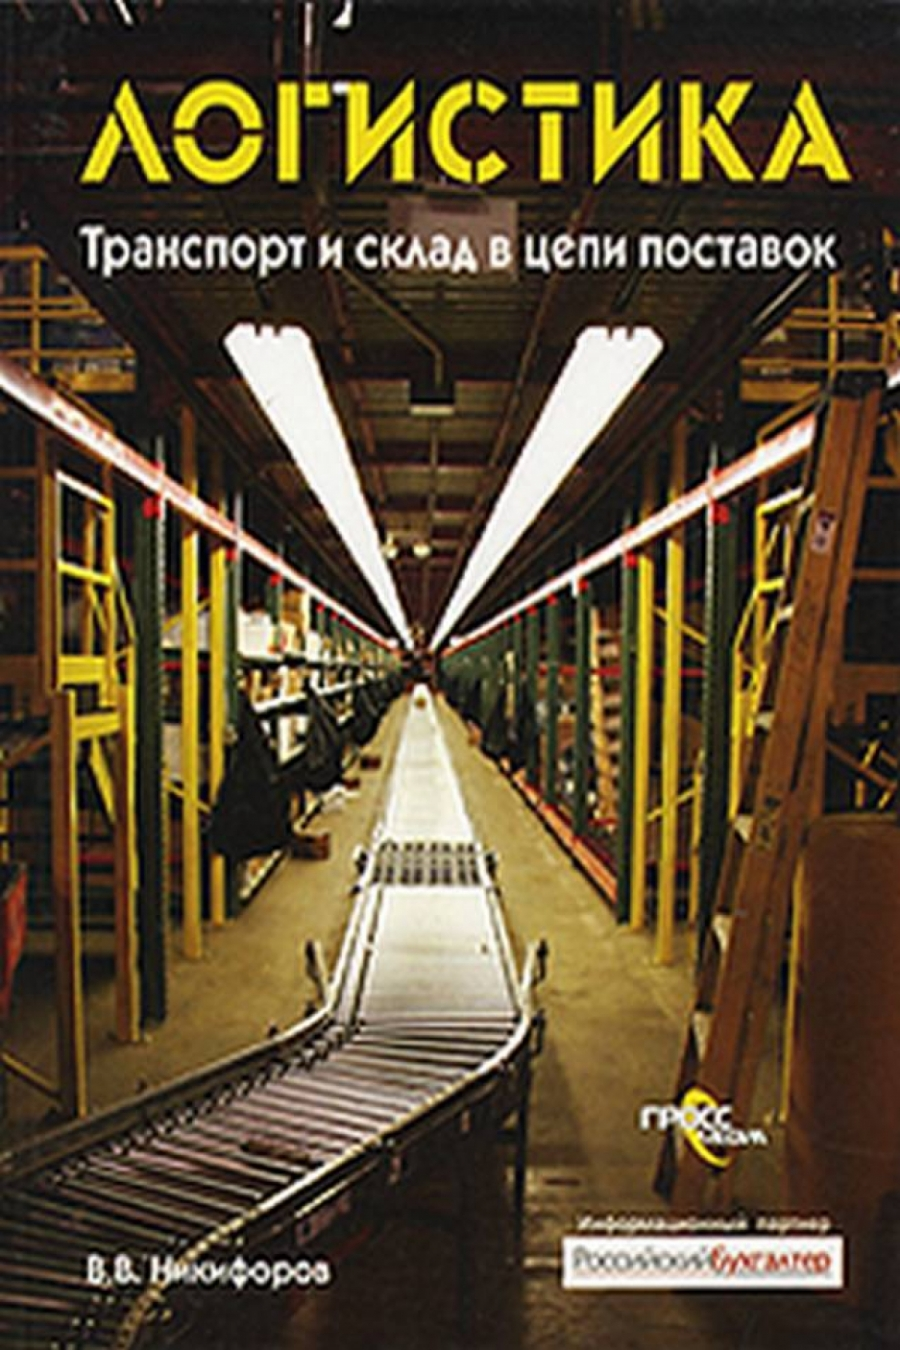 Обложка книги:  никифоров в.в. - логистика. транспорт и склад в цепи поставок